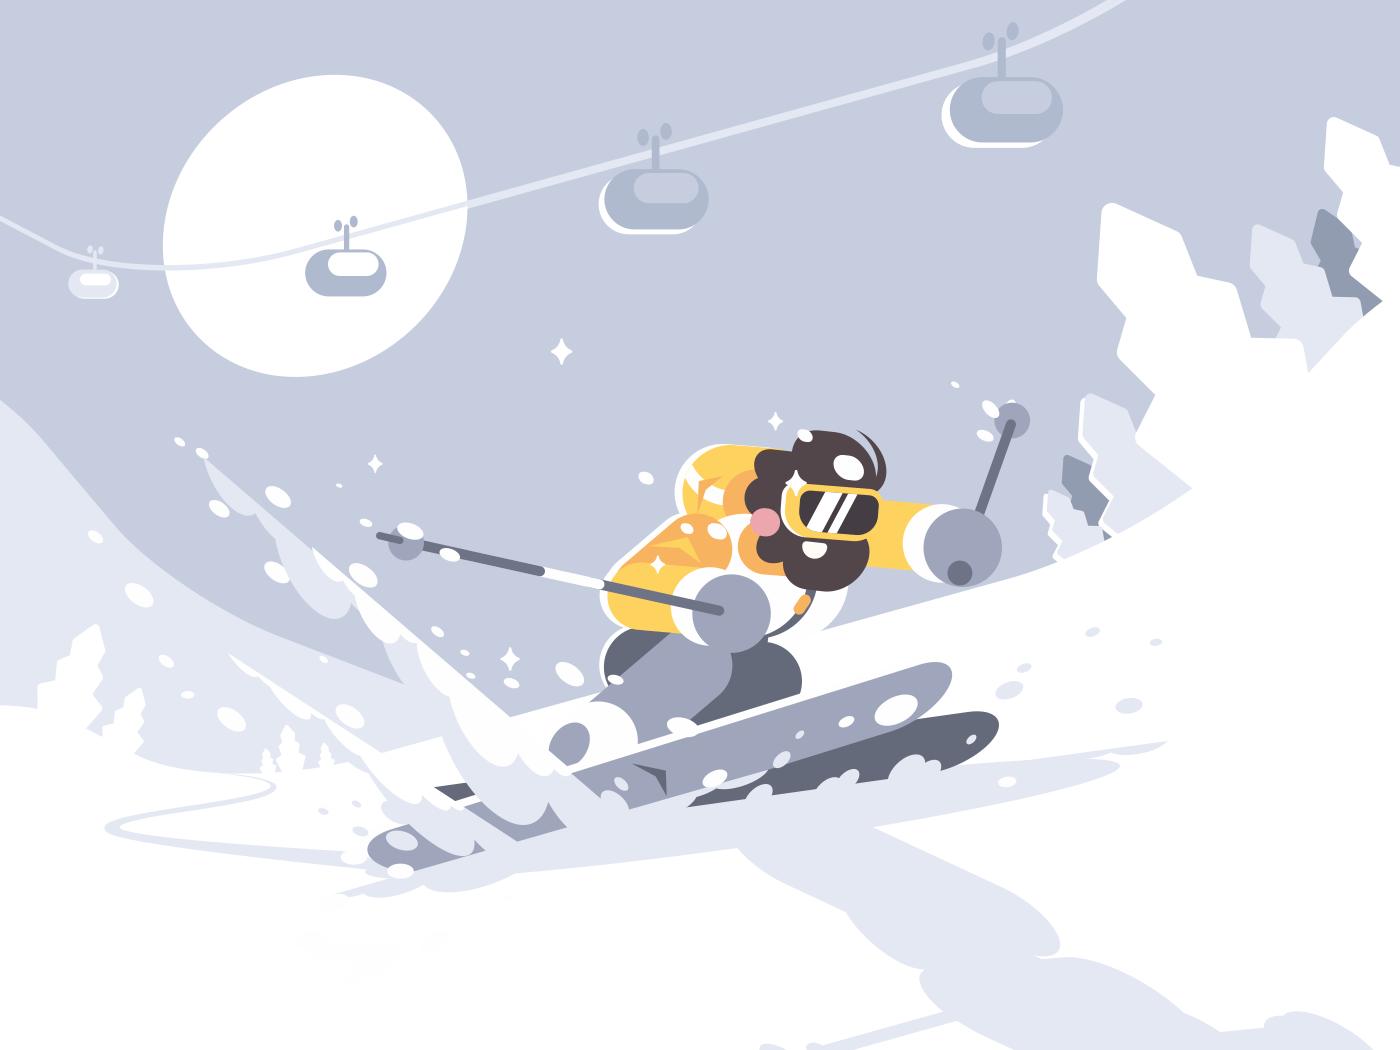 Skier skiing in ski resort. Winter activities rest. Vector illustration